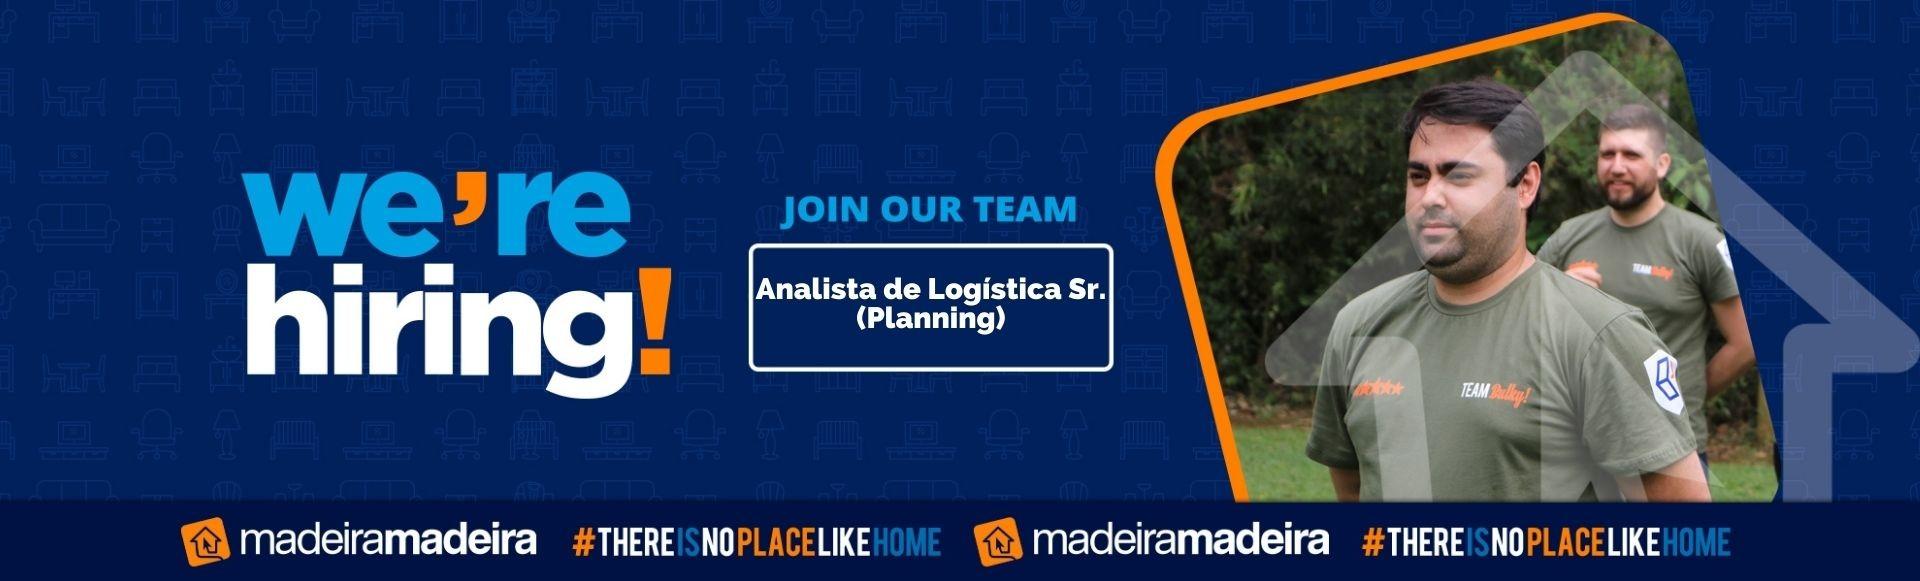 Analista de Logística Sr. (Planning)